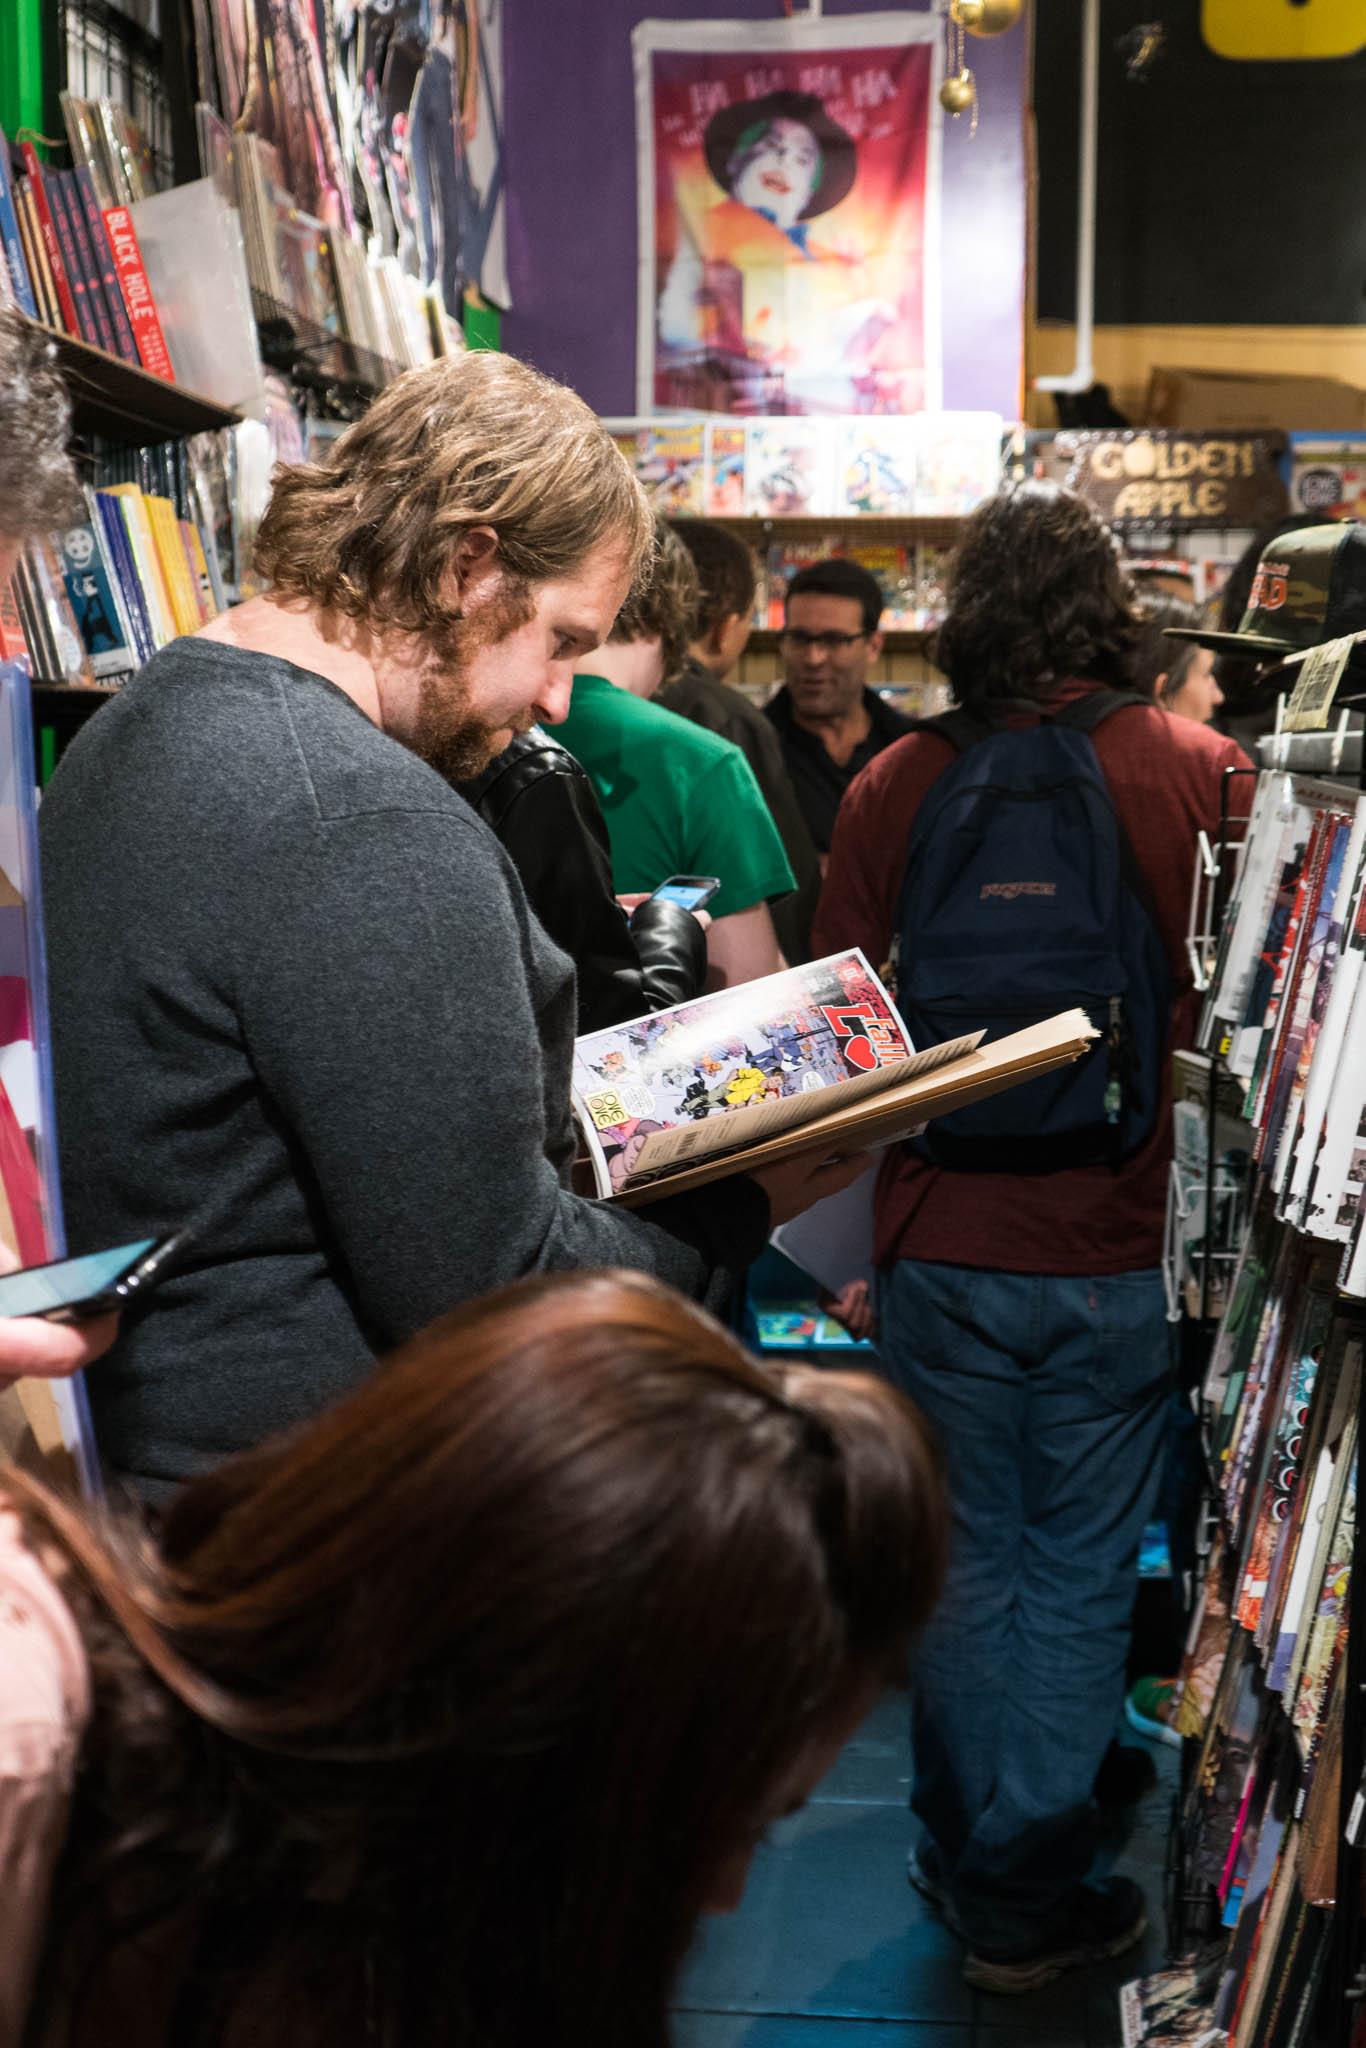 Love Is Love, Golden Apple Comics, Marc Andreyko, DC Comics, IDW Publishing, Crowd, Autograph, Line